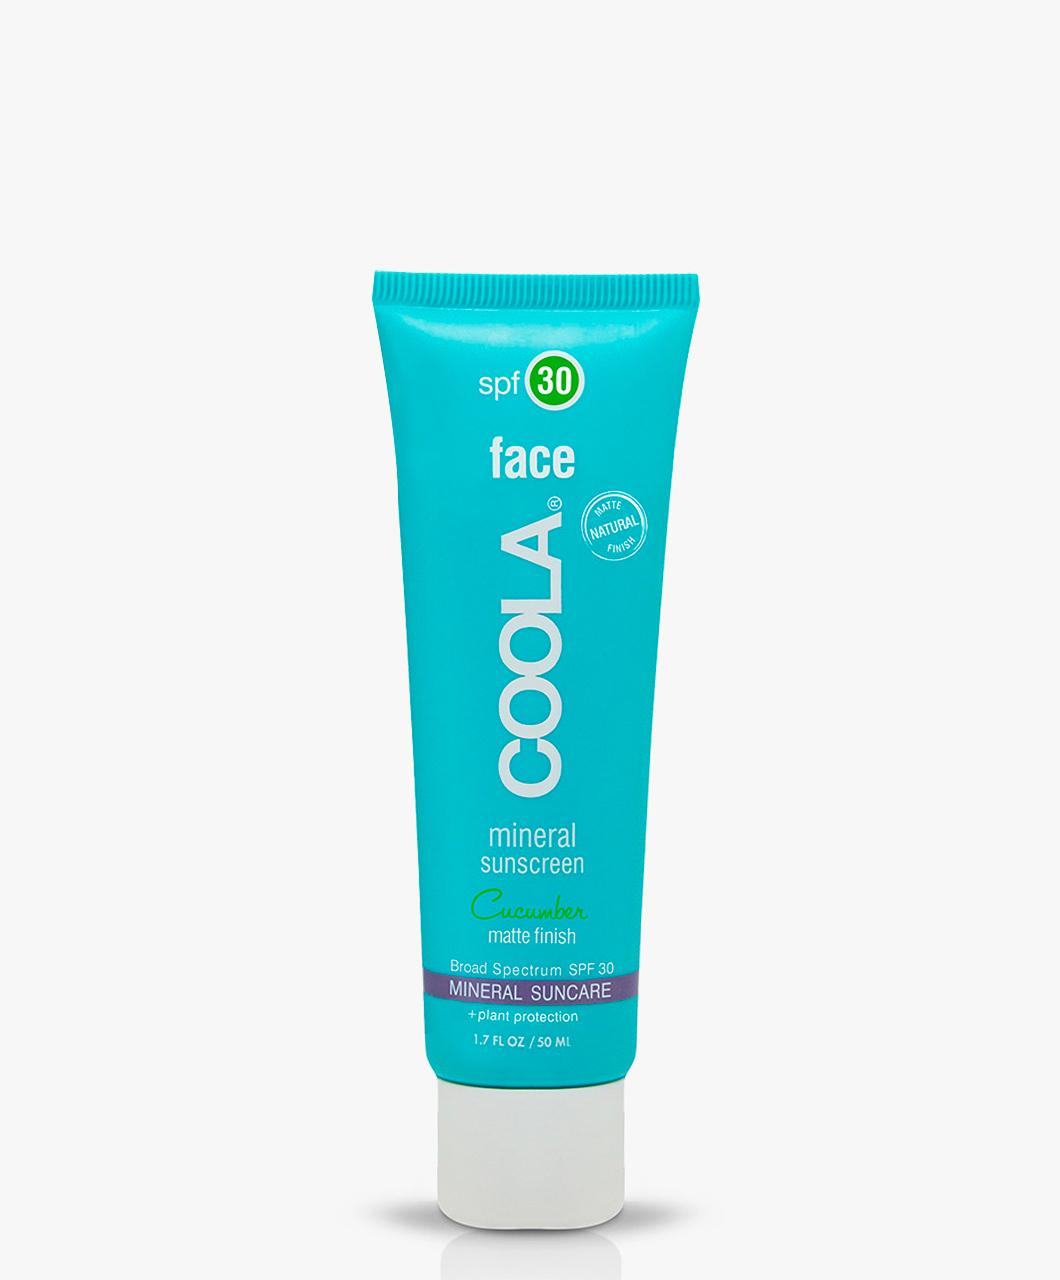 Afbeelding van Coola Sunscreen Mineral Face Cucumber